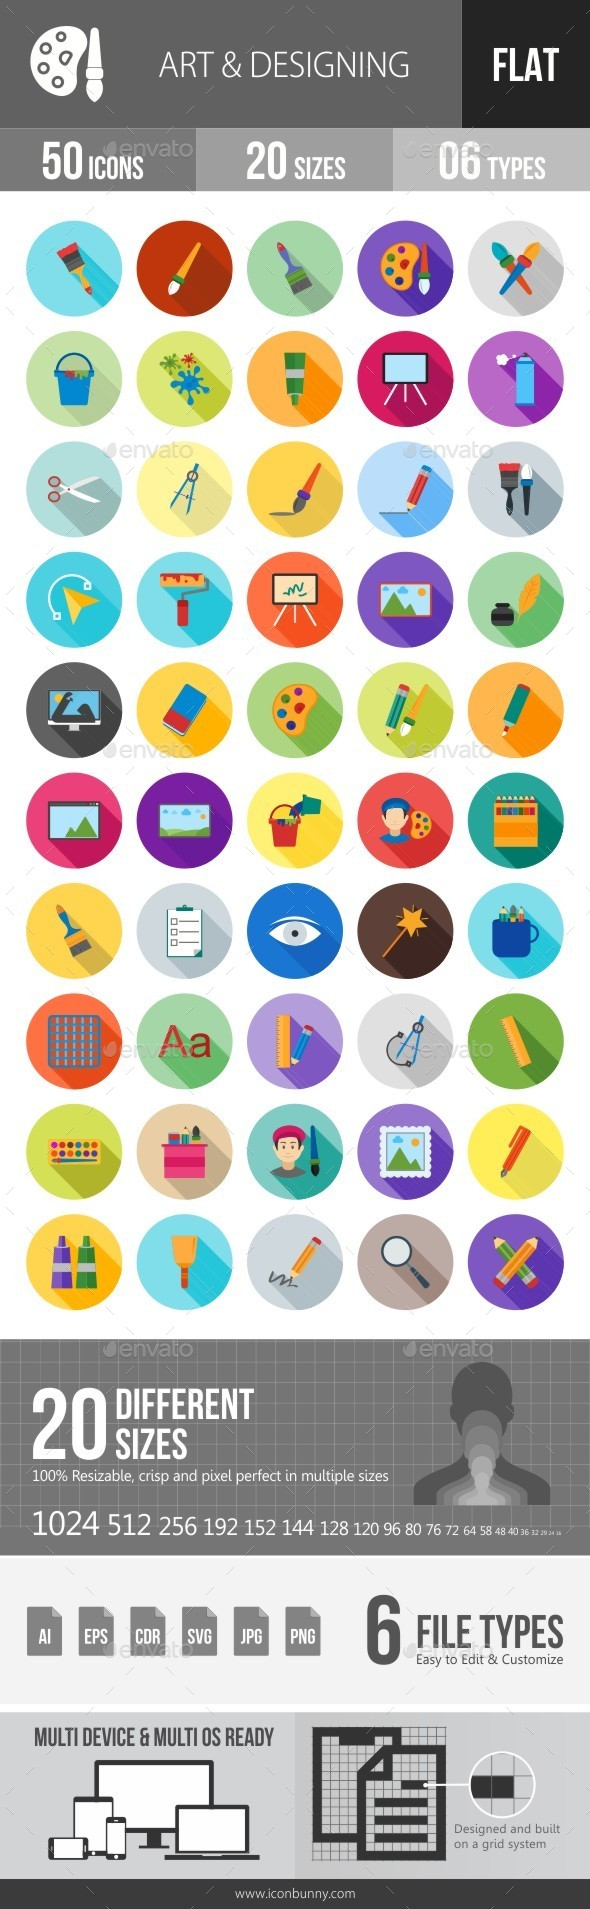 Art & Designing Flat Shadowed Icons - Icons